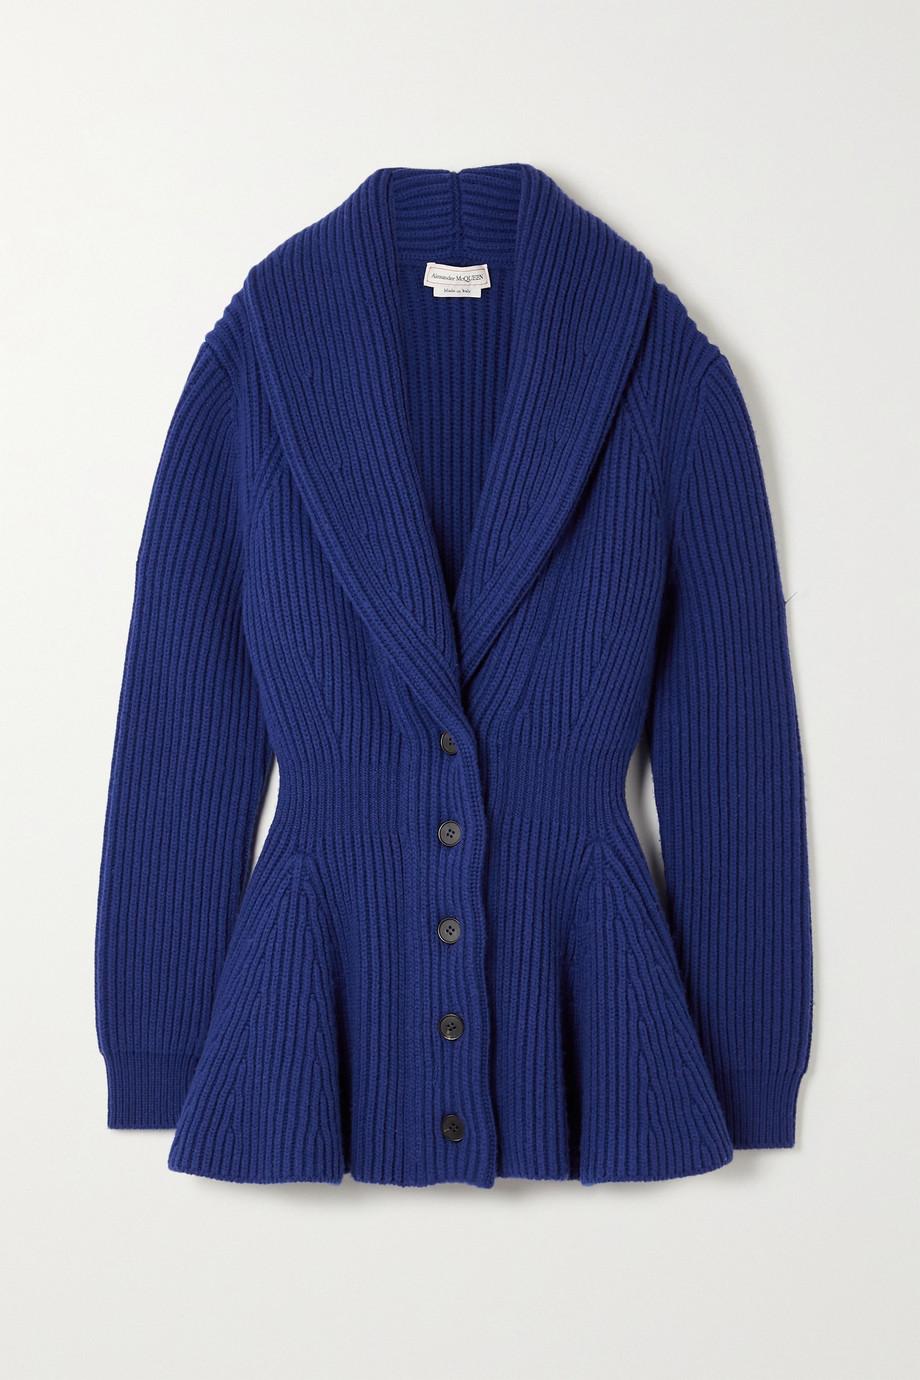 Alexander McQueen Ribbed wool cardigan